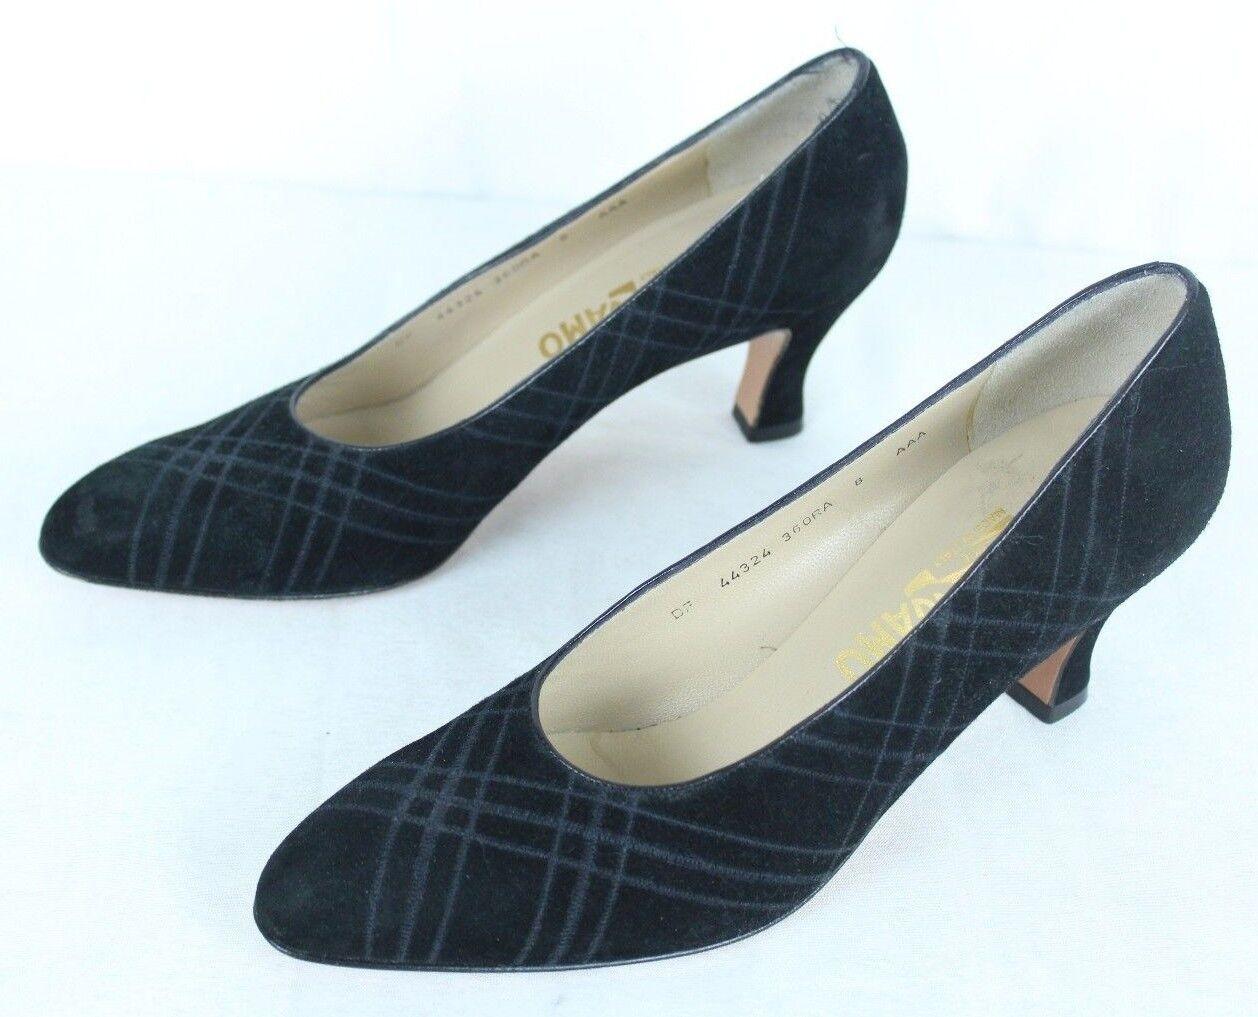 acquisto limitato FERRAGAMO ITALY ITALY ITALY Classic nero Suede Subtle Hatch Heels Pumps scarpe US 8 AAA  qualità autentica